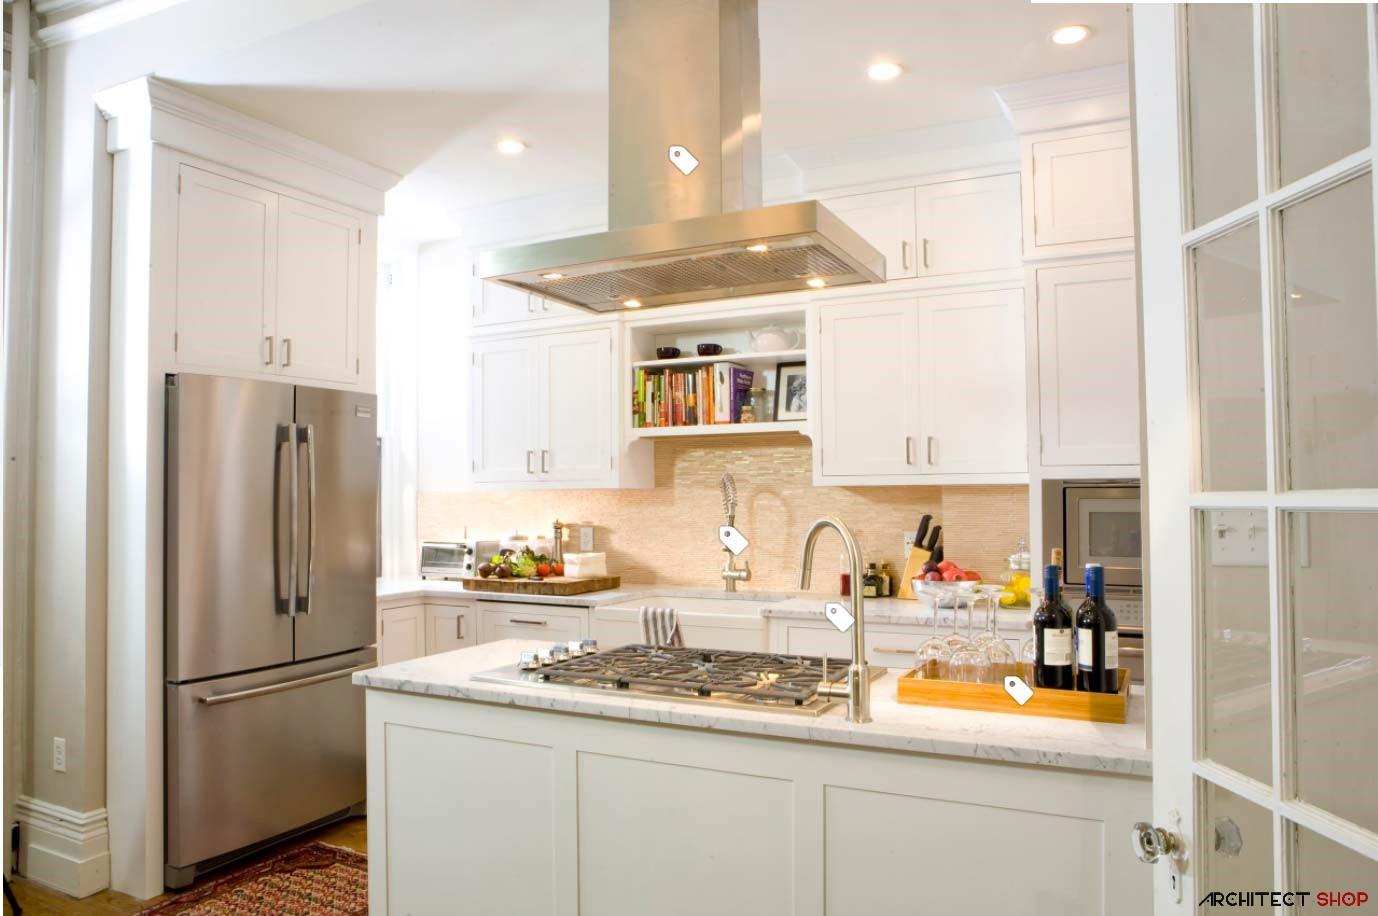 کانسپتهای طراحی پیشخوان آشپزخانه - house beach style kitchen atlanta 5